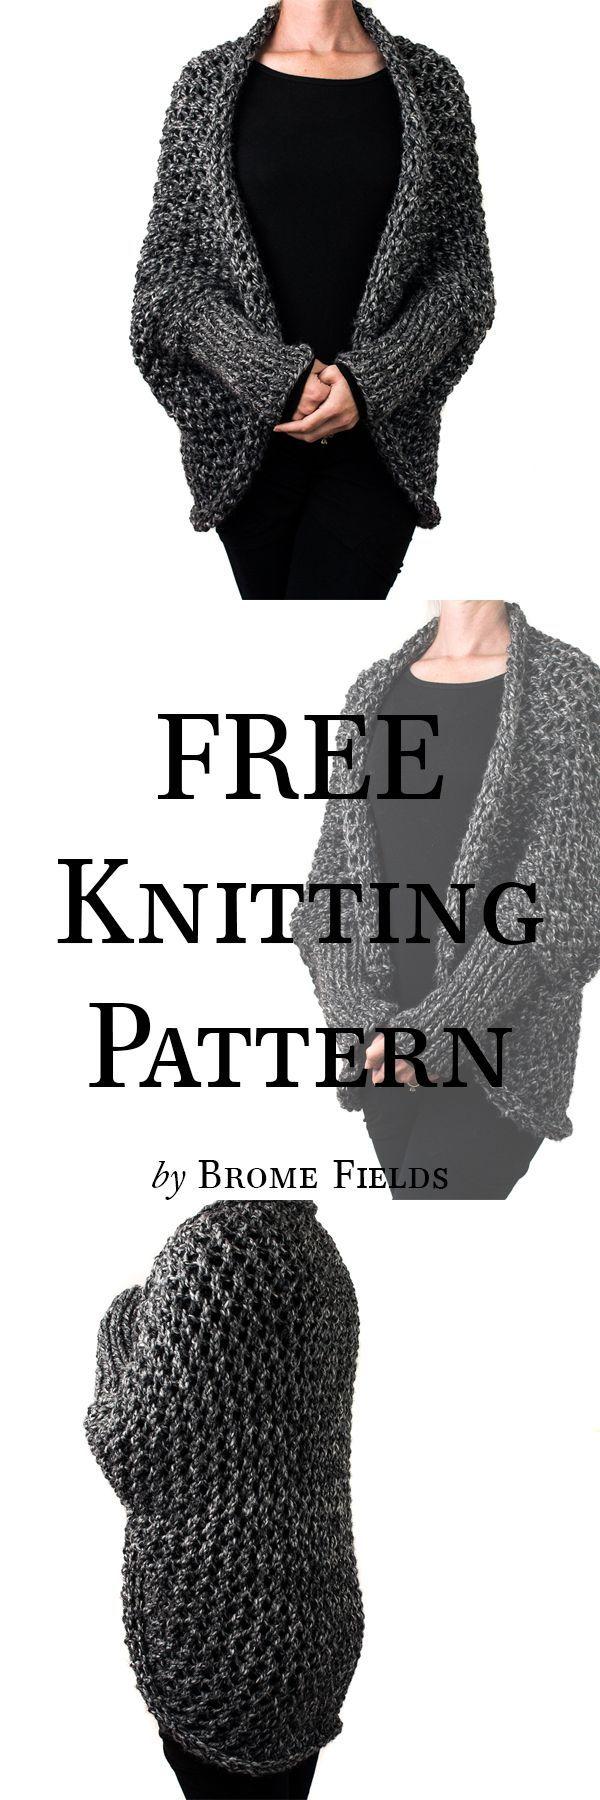 {FREE} RESOLVE: Cocoon Knitting Pattern   - Knitting 7 - #Cocoon #Free #Knitting #Pattern #RESOLVE #blanketsweater